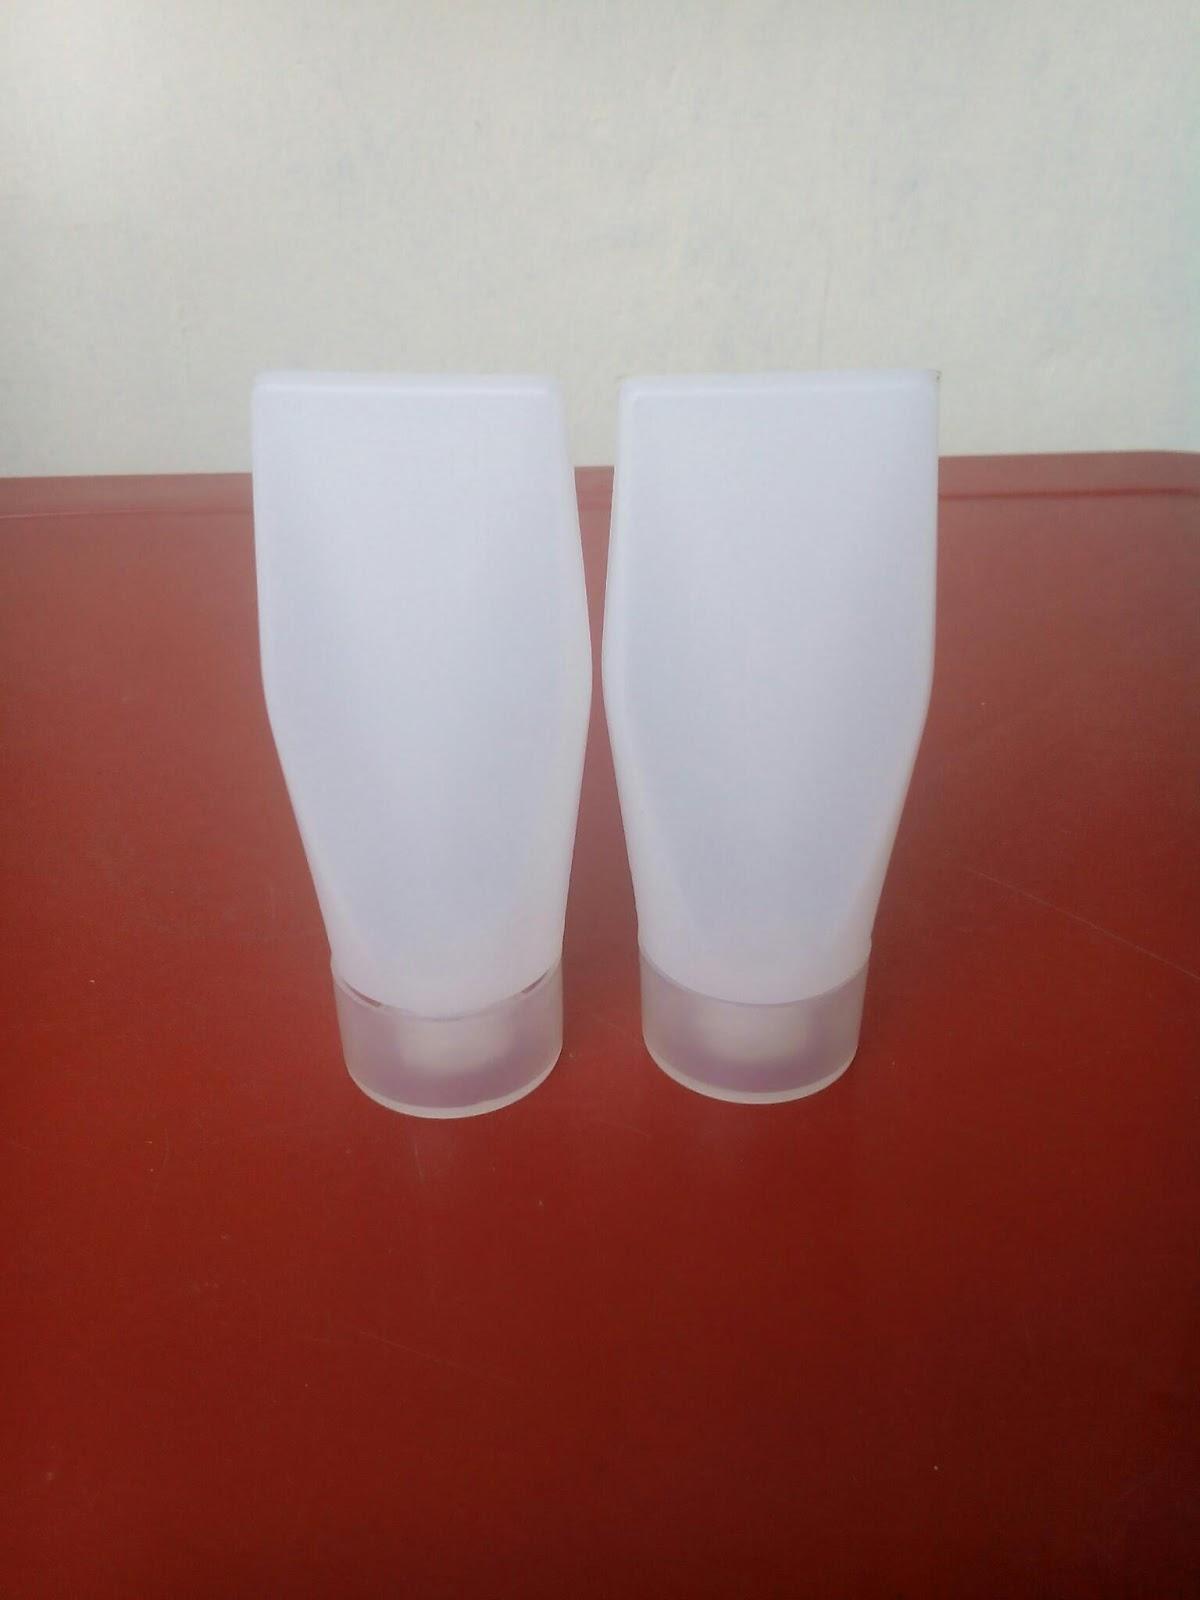 Bintang Botol Plastik Jual Shampo Hotel 35 Ml Sabun